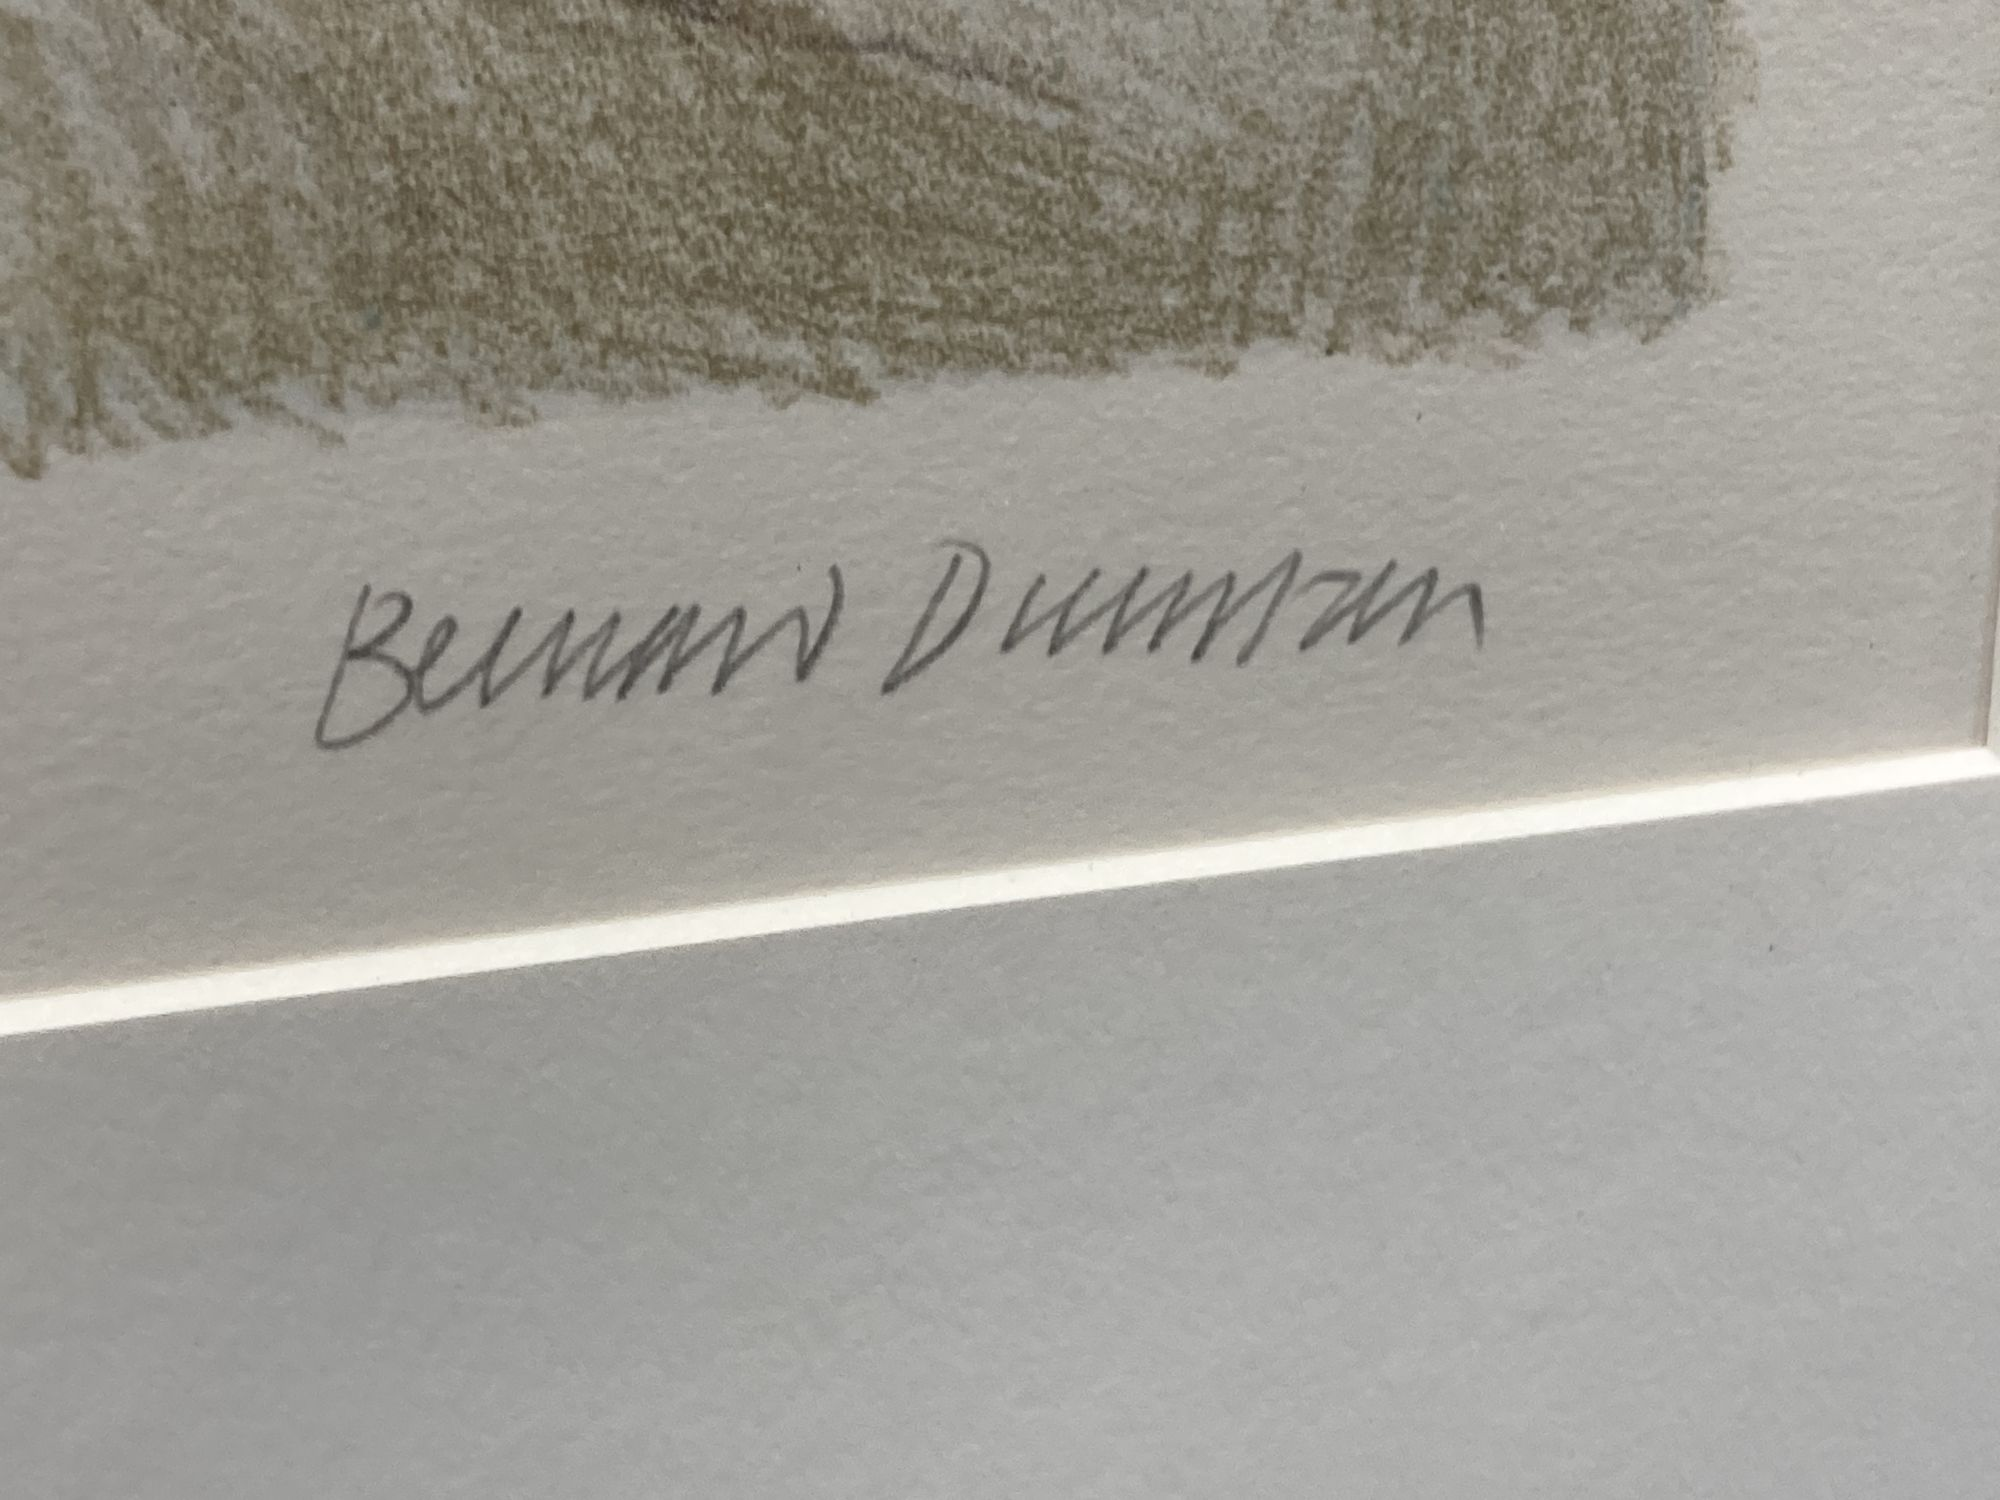 Bernard Dunstan (1920-2017), lithograph, 'Nude I', signed in pencil, 12/95, 40 x 39cm. - Image 3 of 4